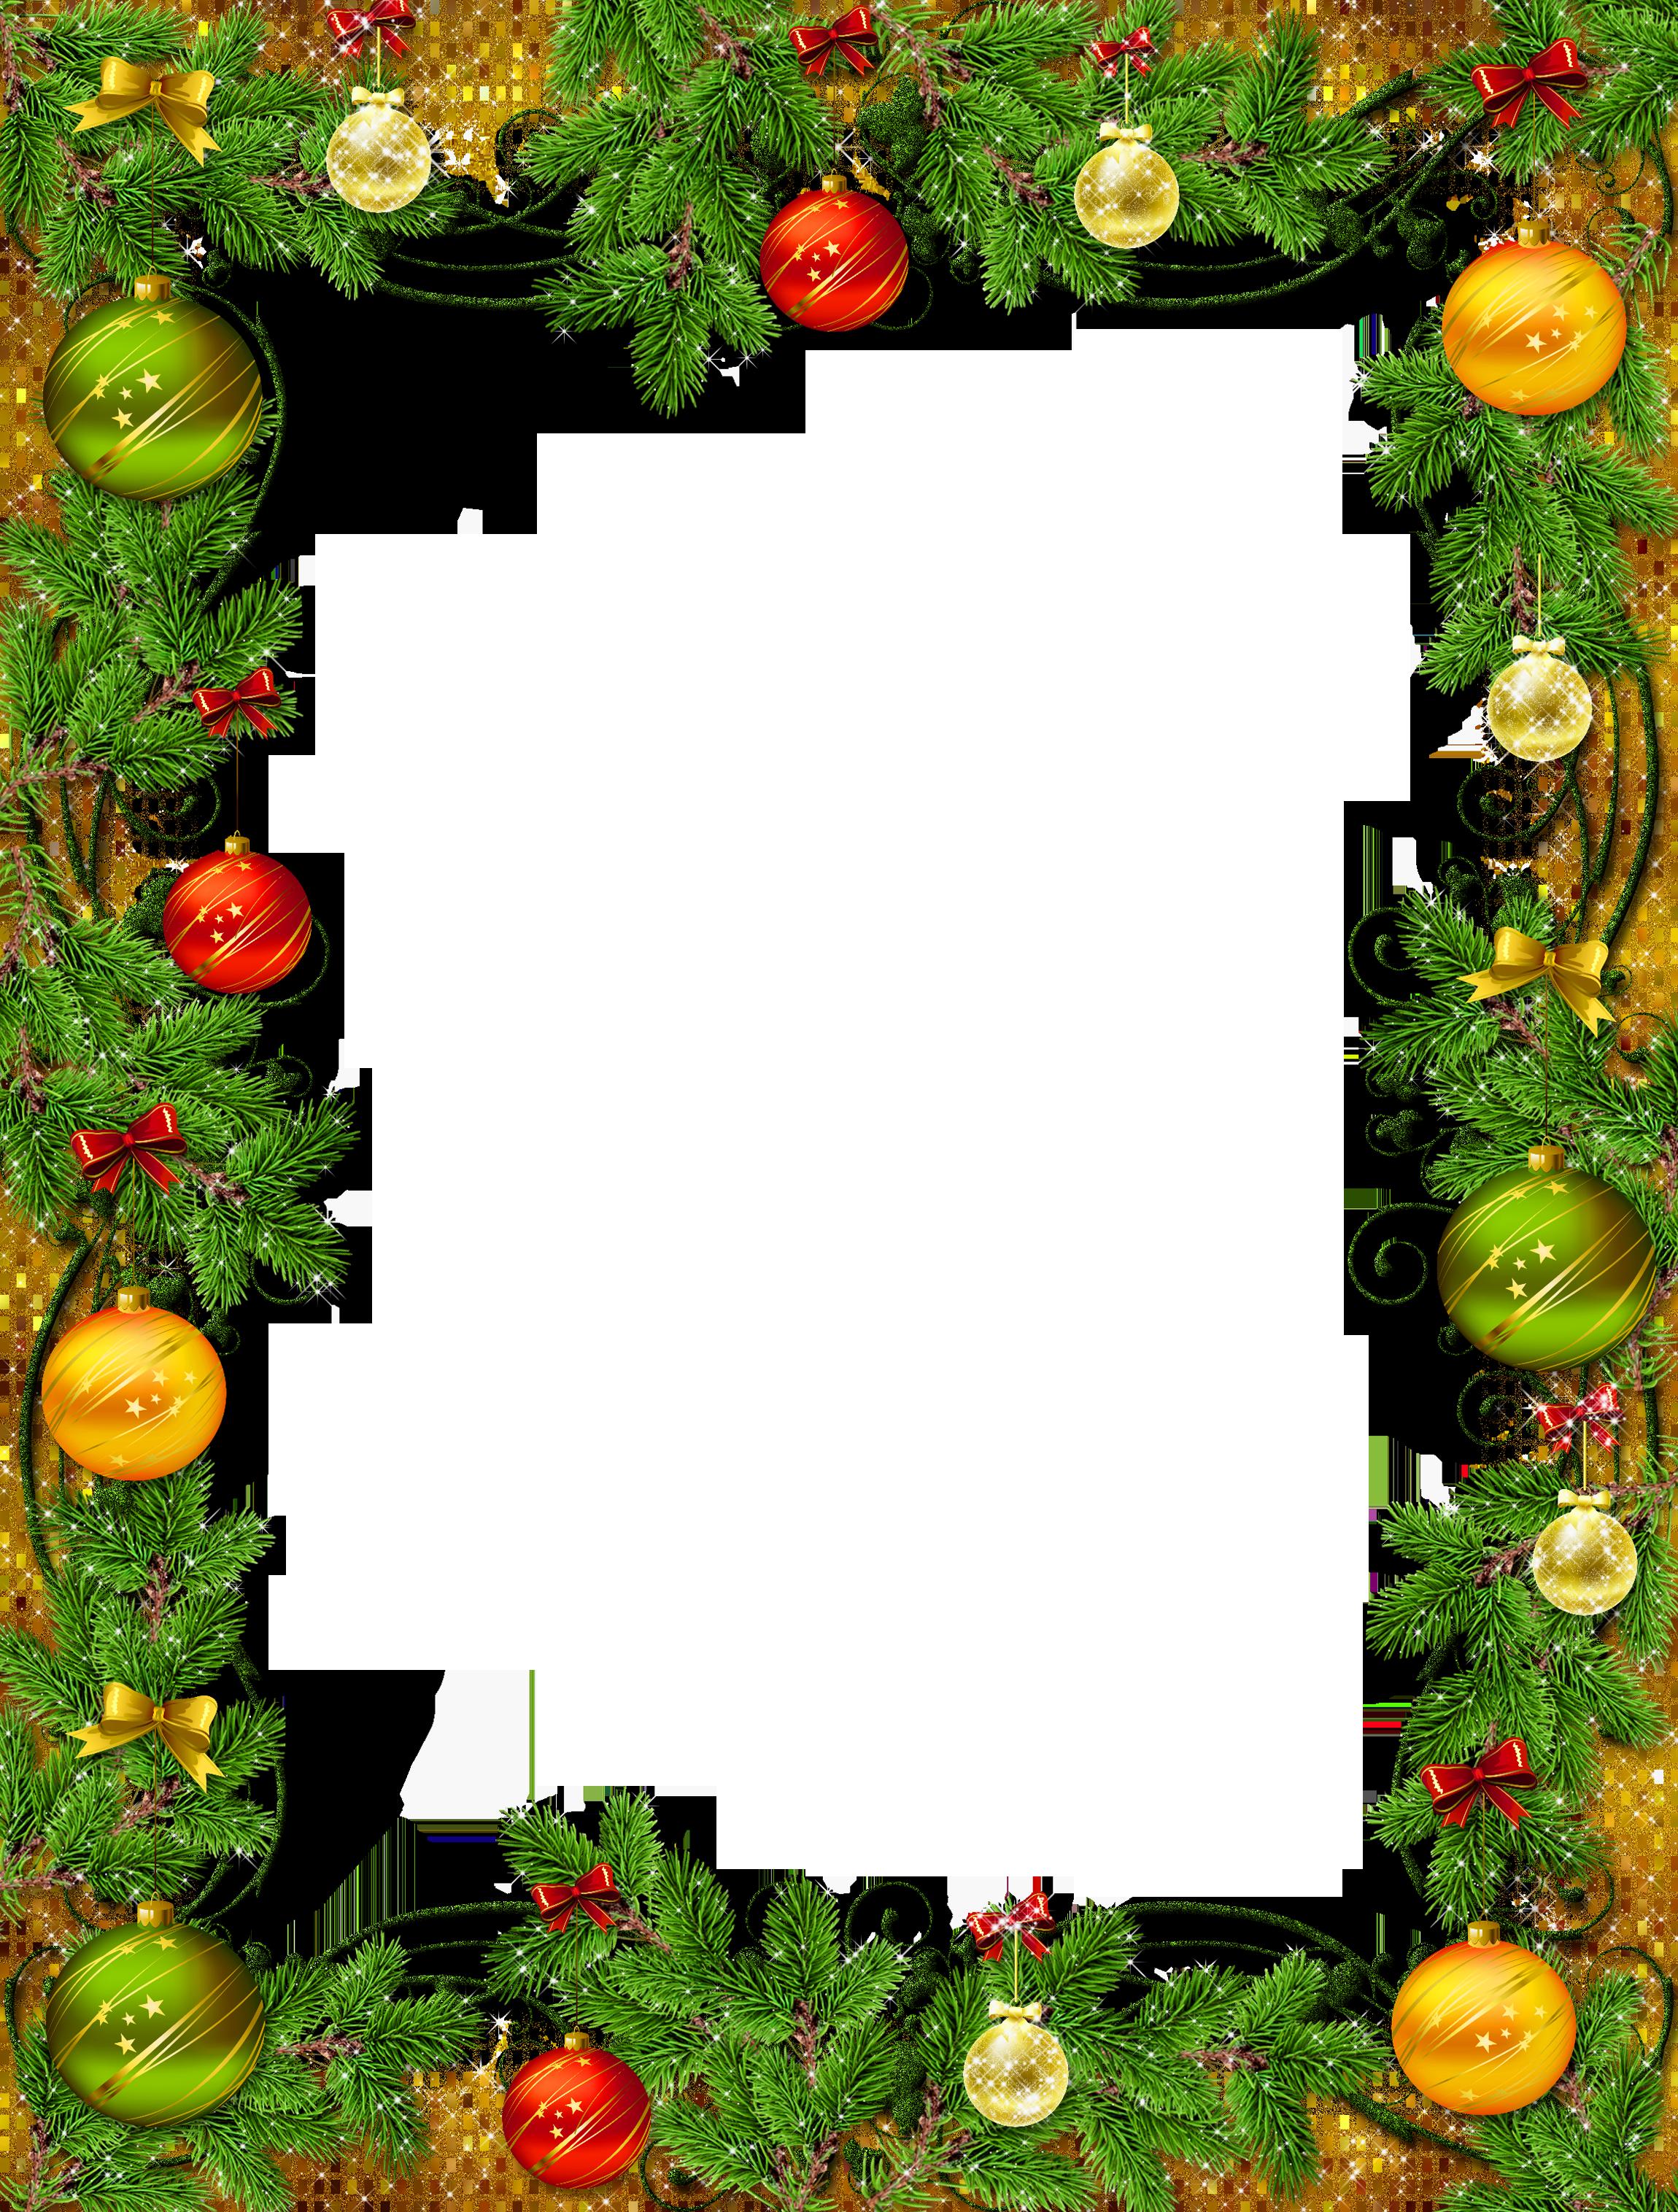 Christmas decoration png transparent. Winter clipart frame